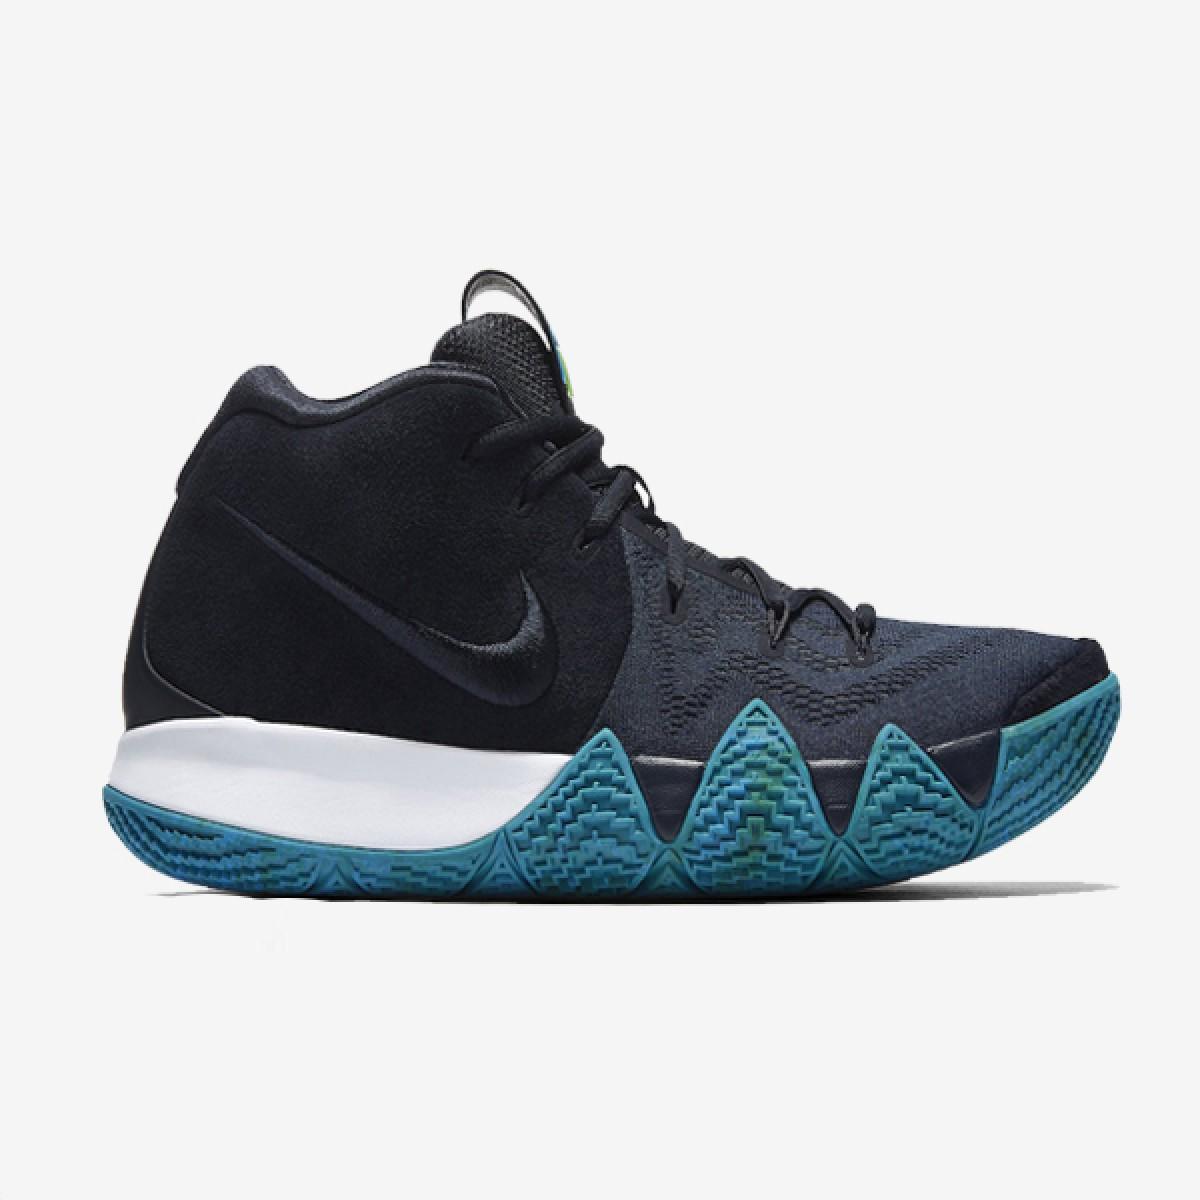 Nike Kyrie 4 GS 'Obsidian'